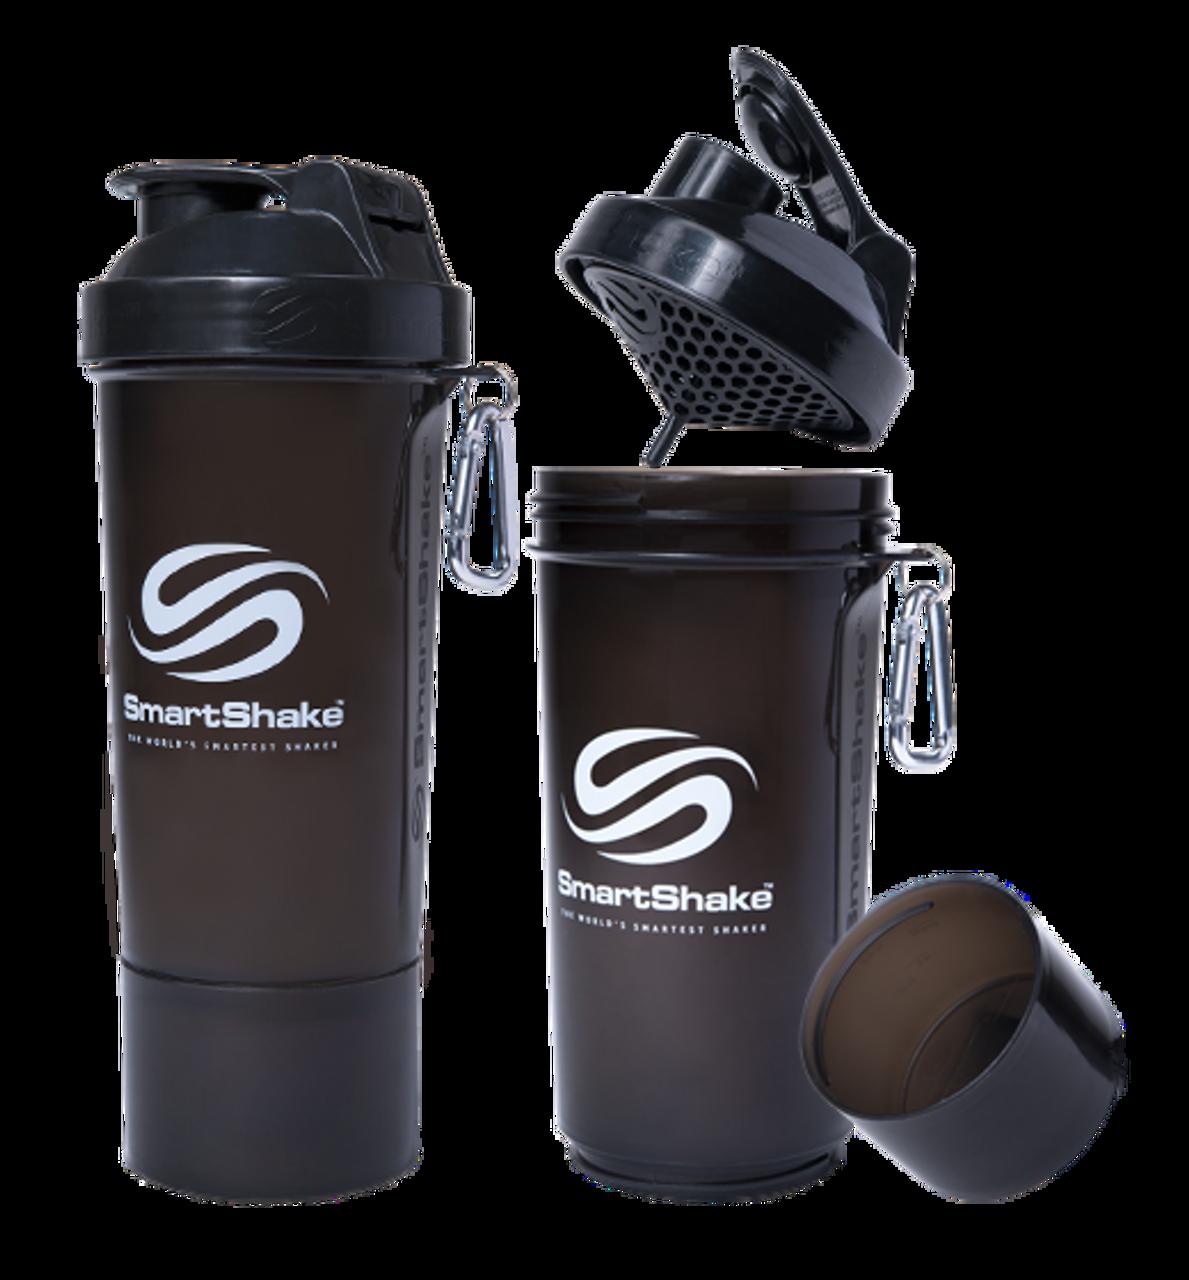 SmartShake Slim 500ml //17oz Smart Shaker Bottle Mixer Blender Whey Protein Shake